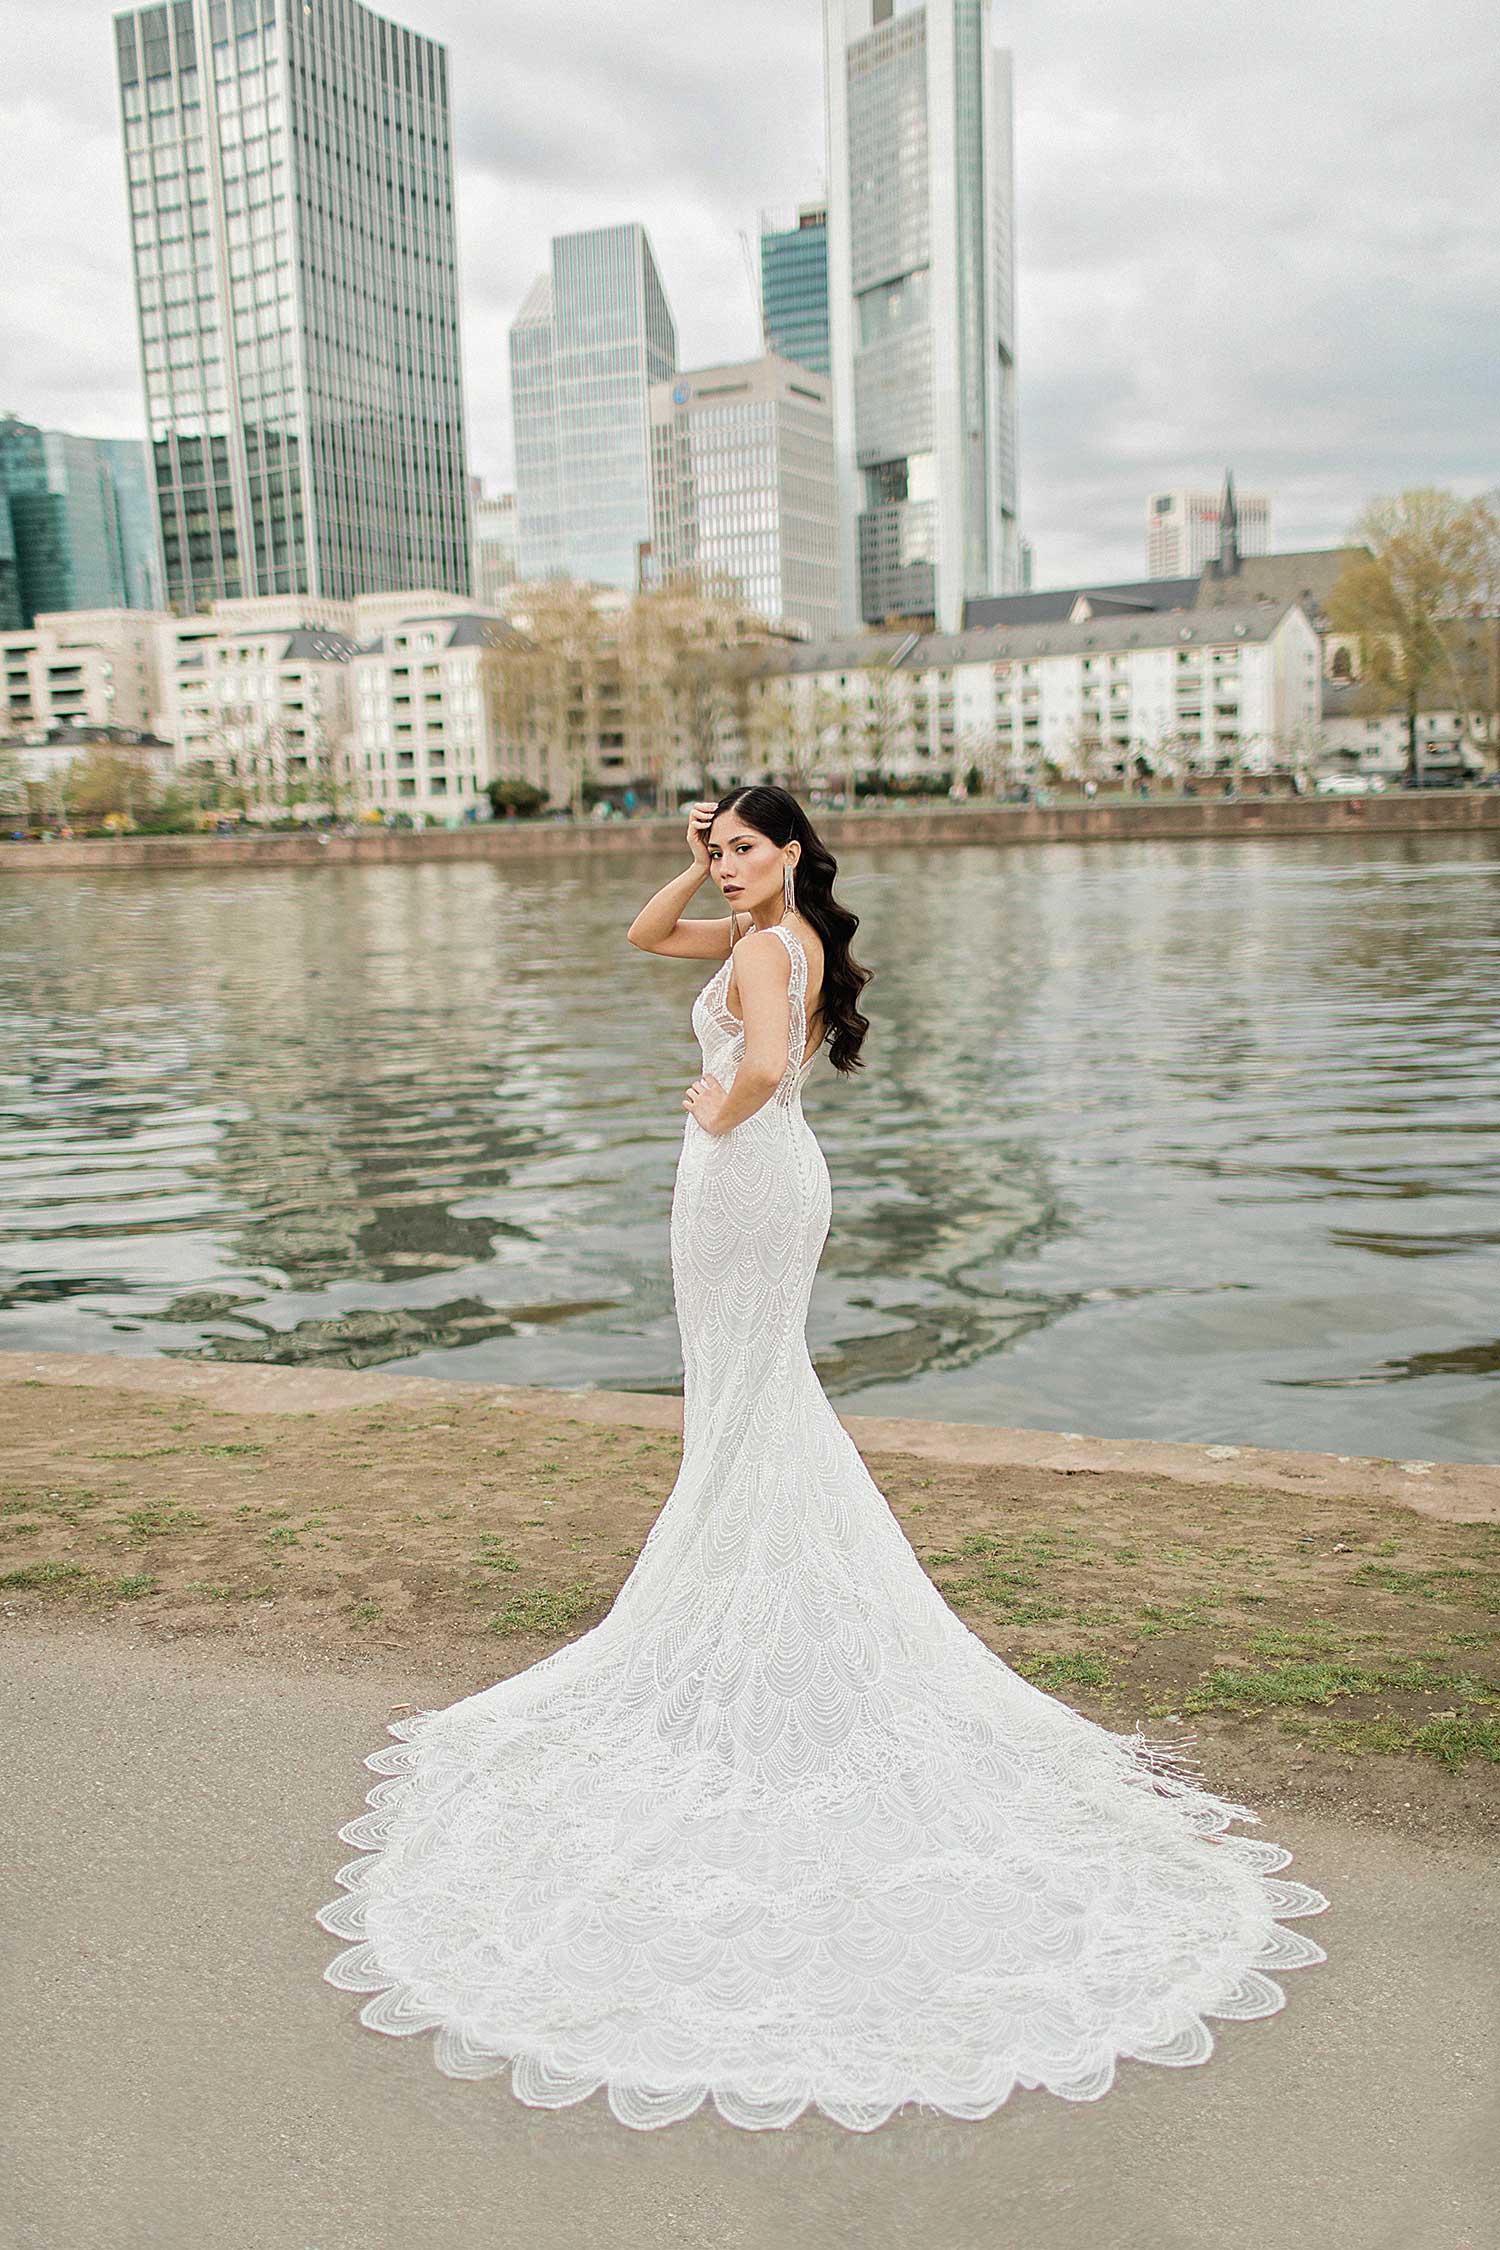 Outdoor wedding editorial photoshoot